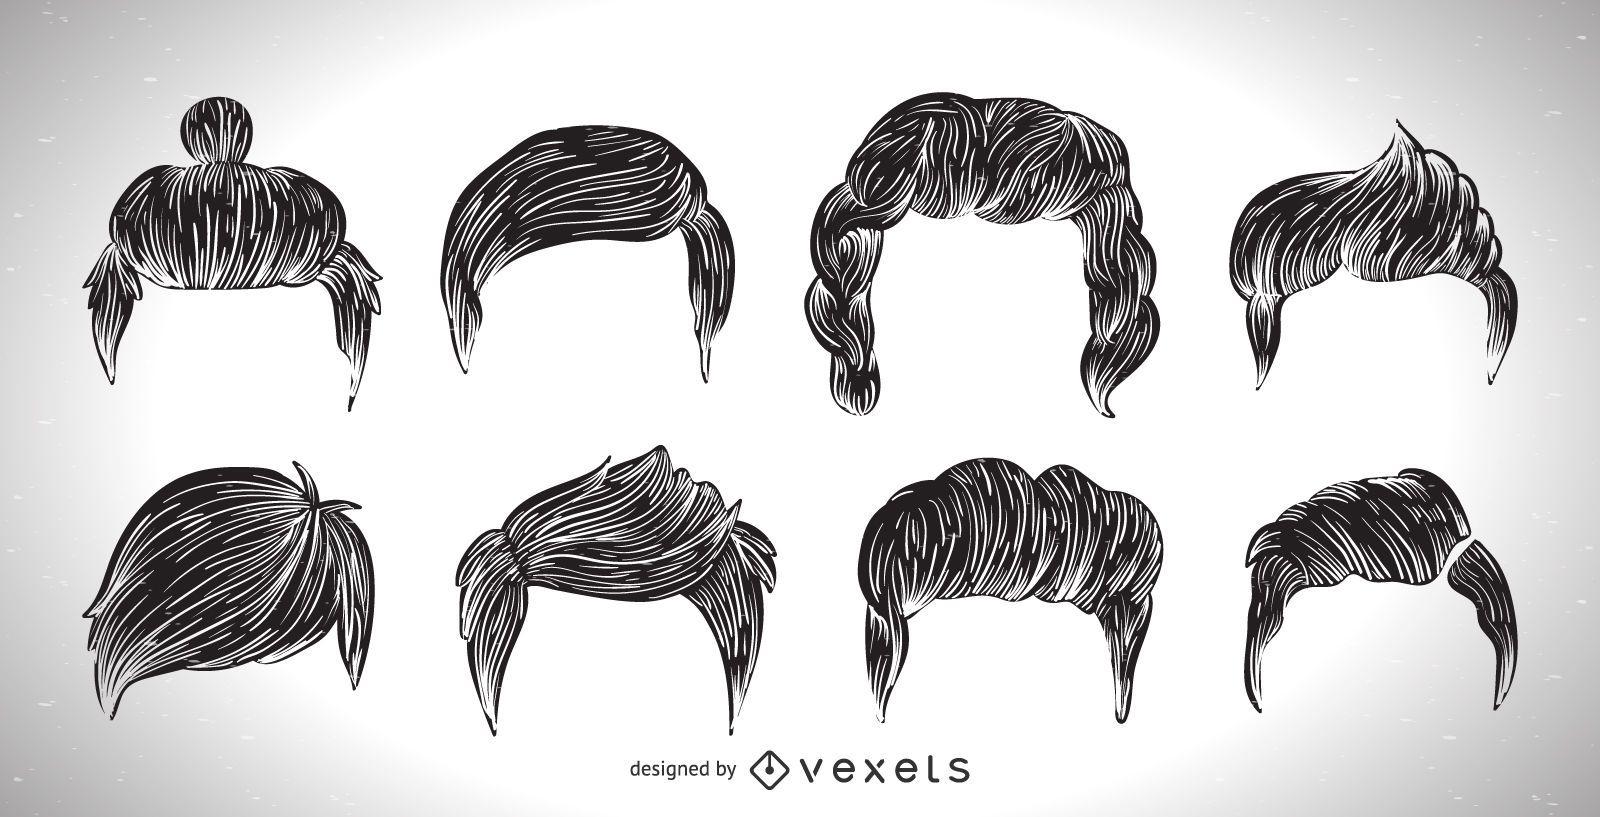 Colección de cortes de pelo para hombres